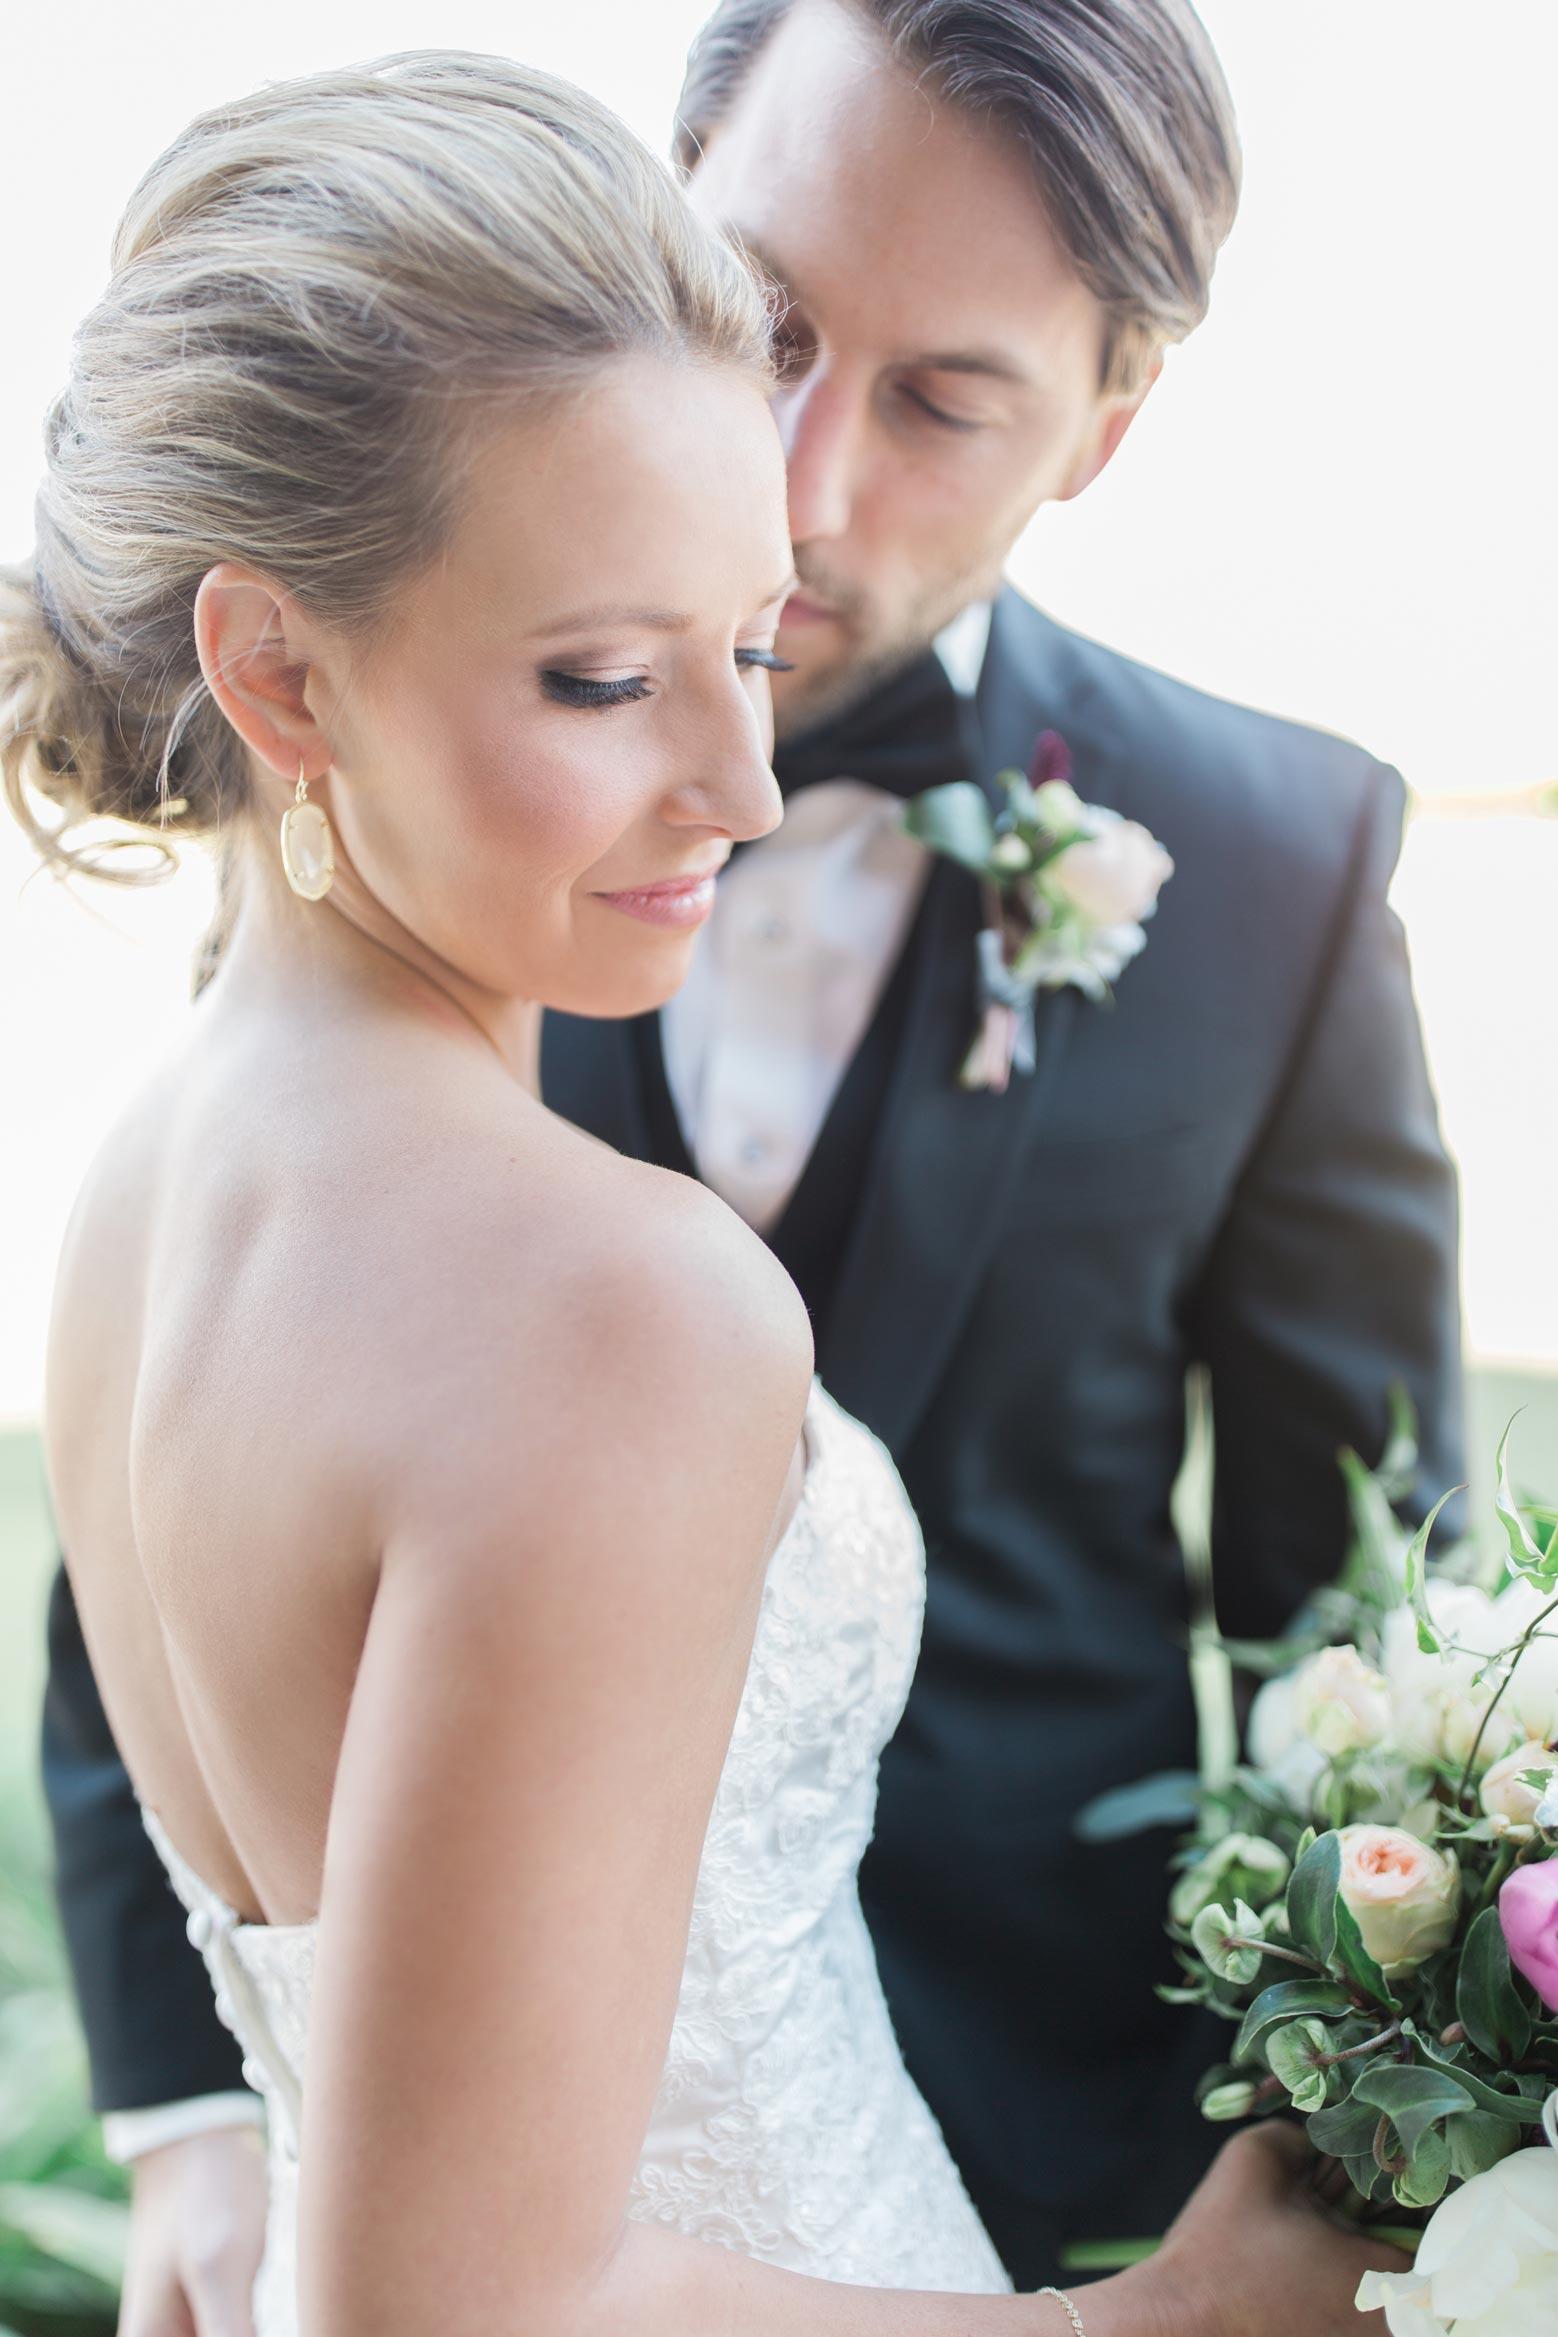 orange-county-fine-art-wedding-photographer-leah-vis-12.jpg